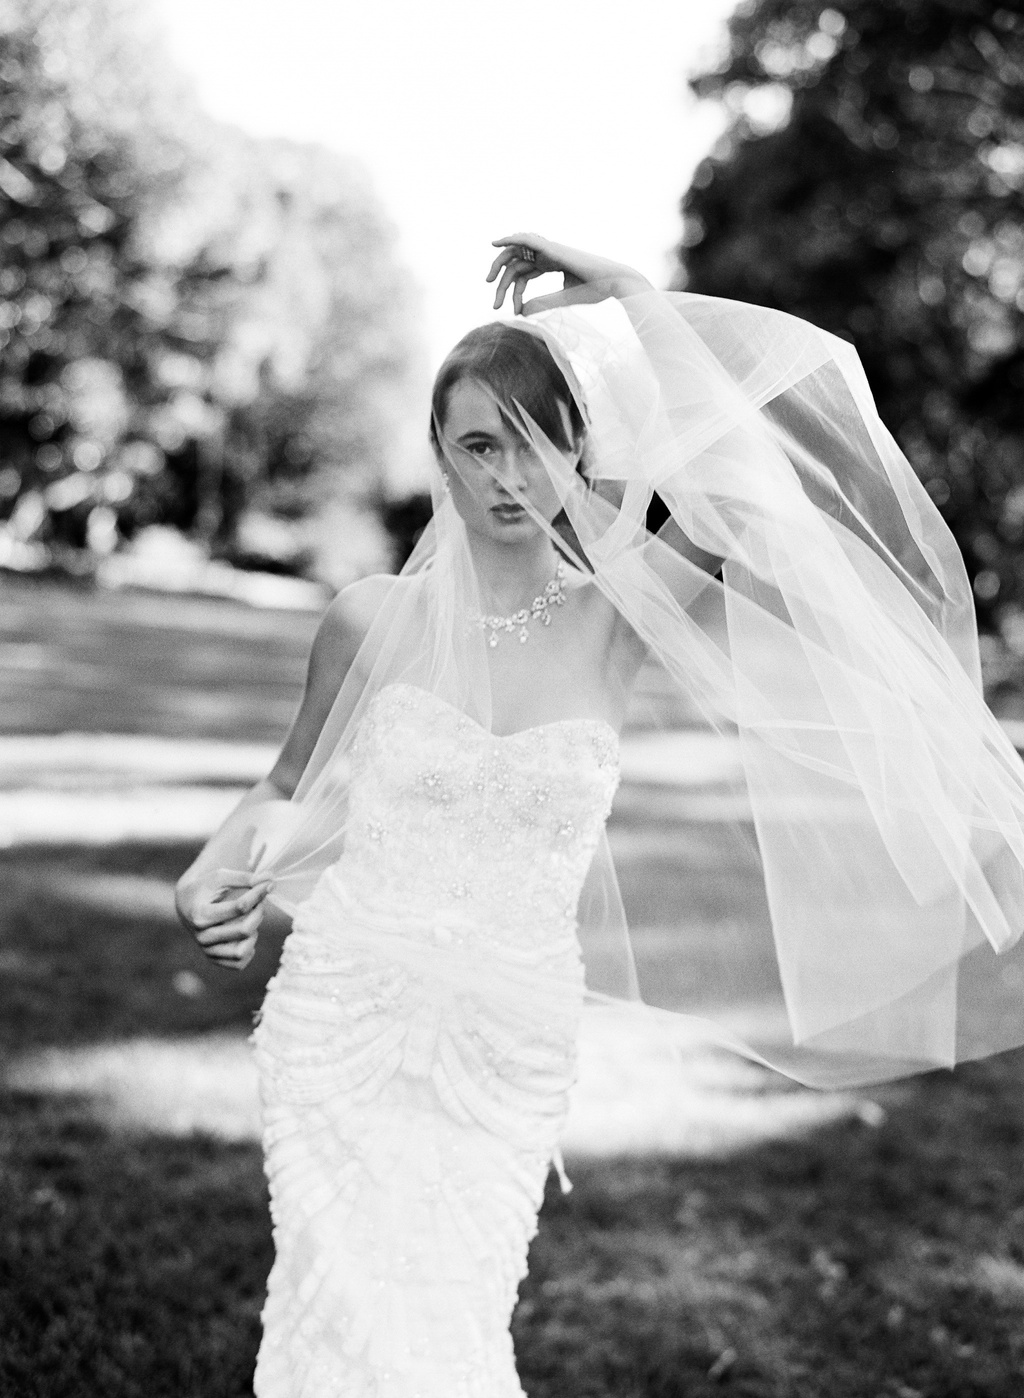 Styled-wedding-beaux-arts-tea-time-monique-lhuillier-santa-barbara-chic-bridal-gown-wedding-dress-photography-325.full